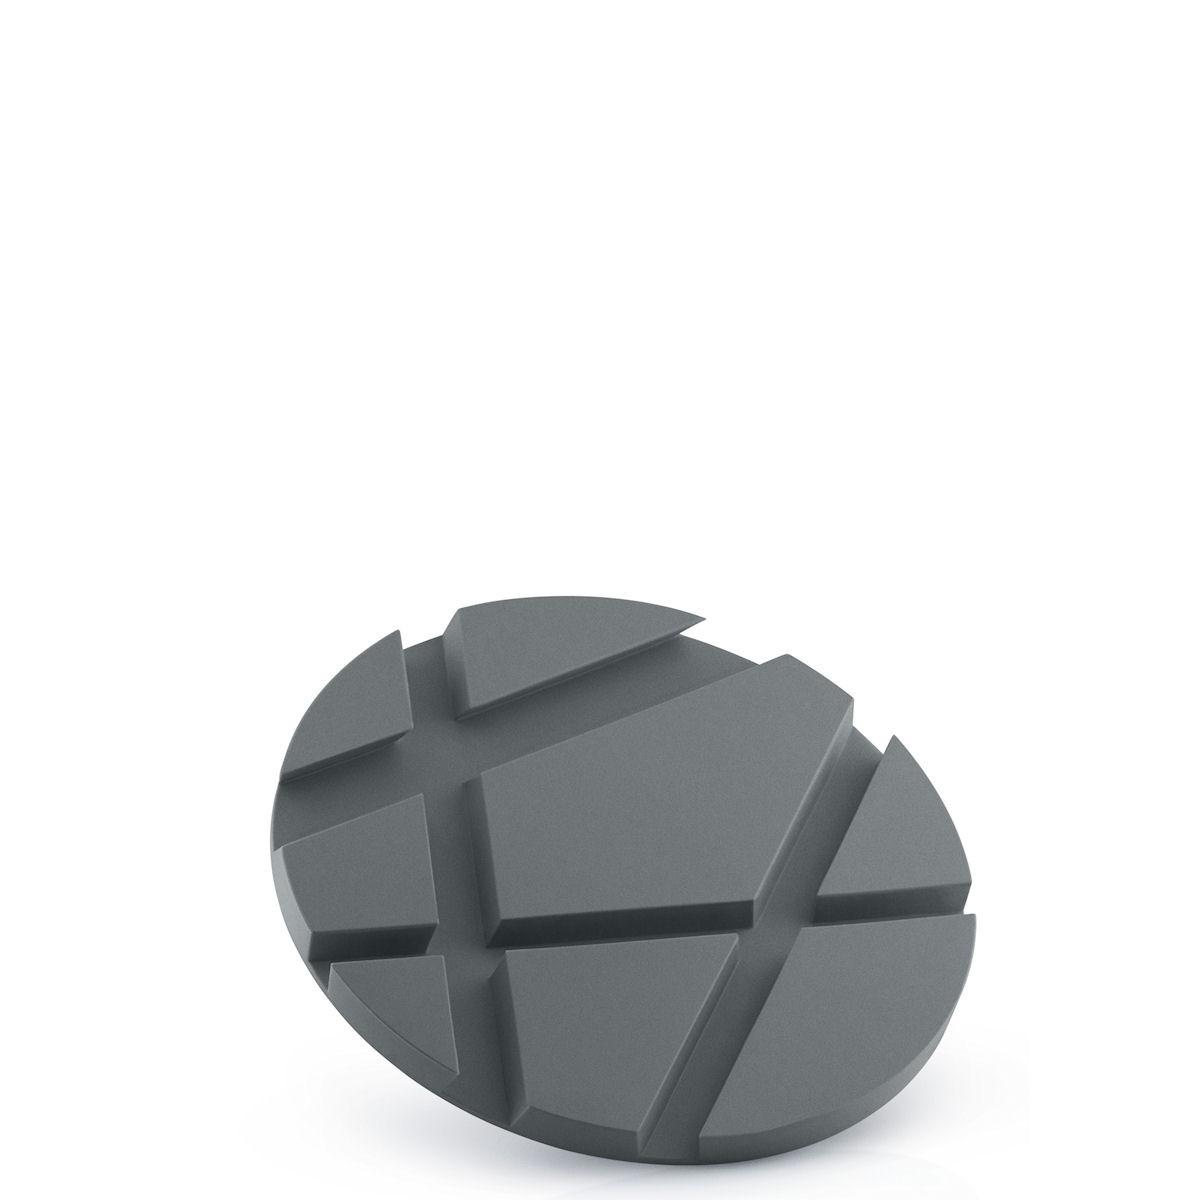 podstawka pod naczynie i tablet eva solo smartmat 530721 sklep. Black Bedroom Furniture Sets. Home Design Ideas